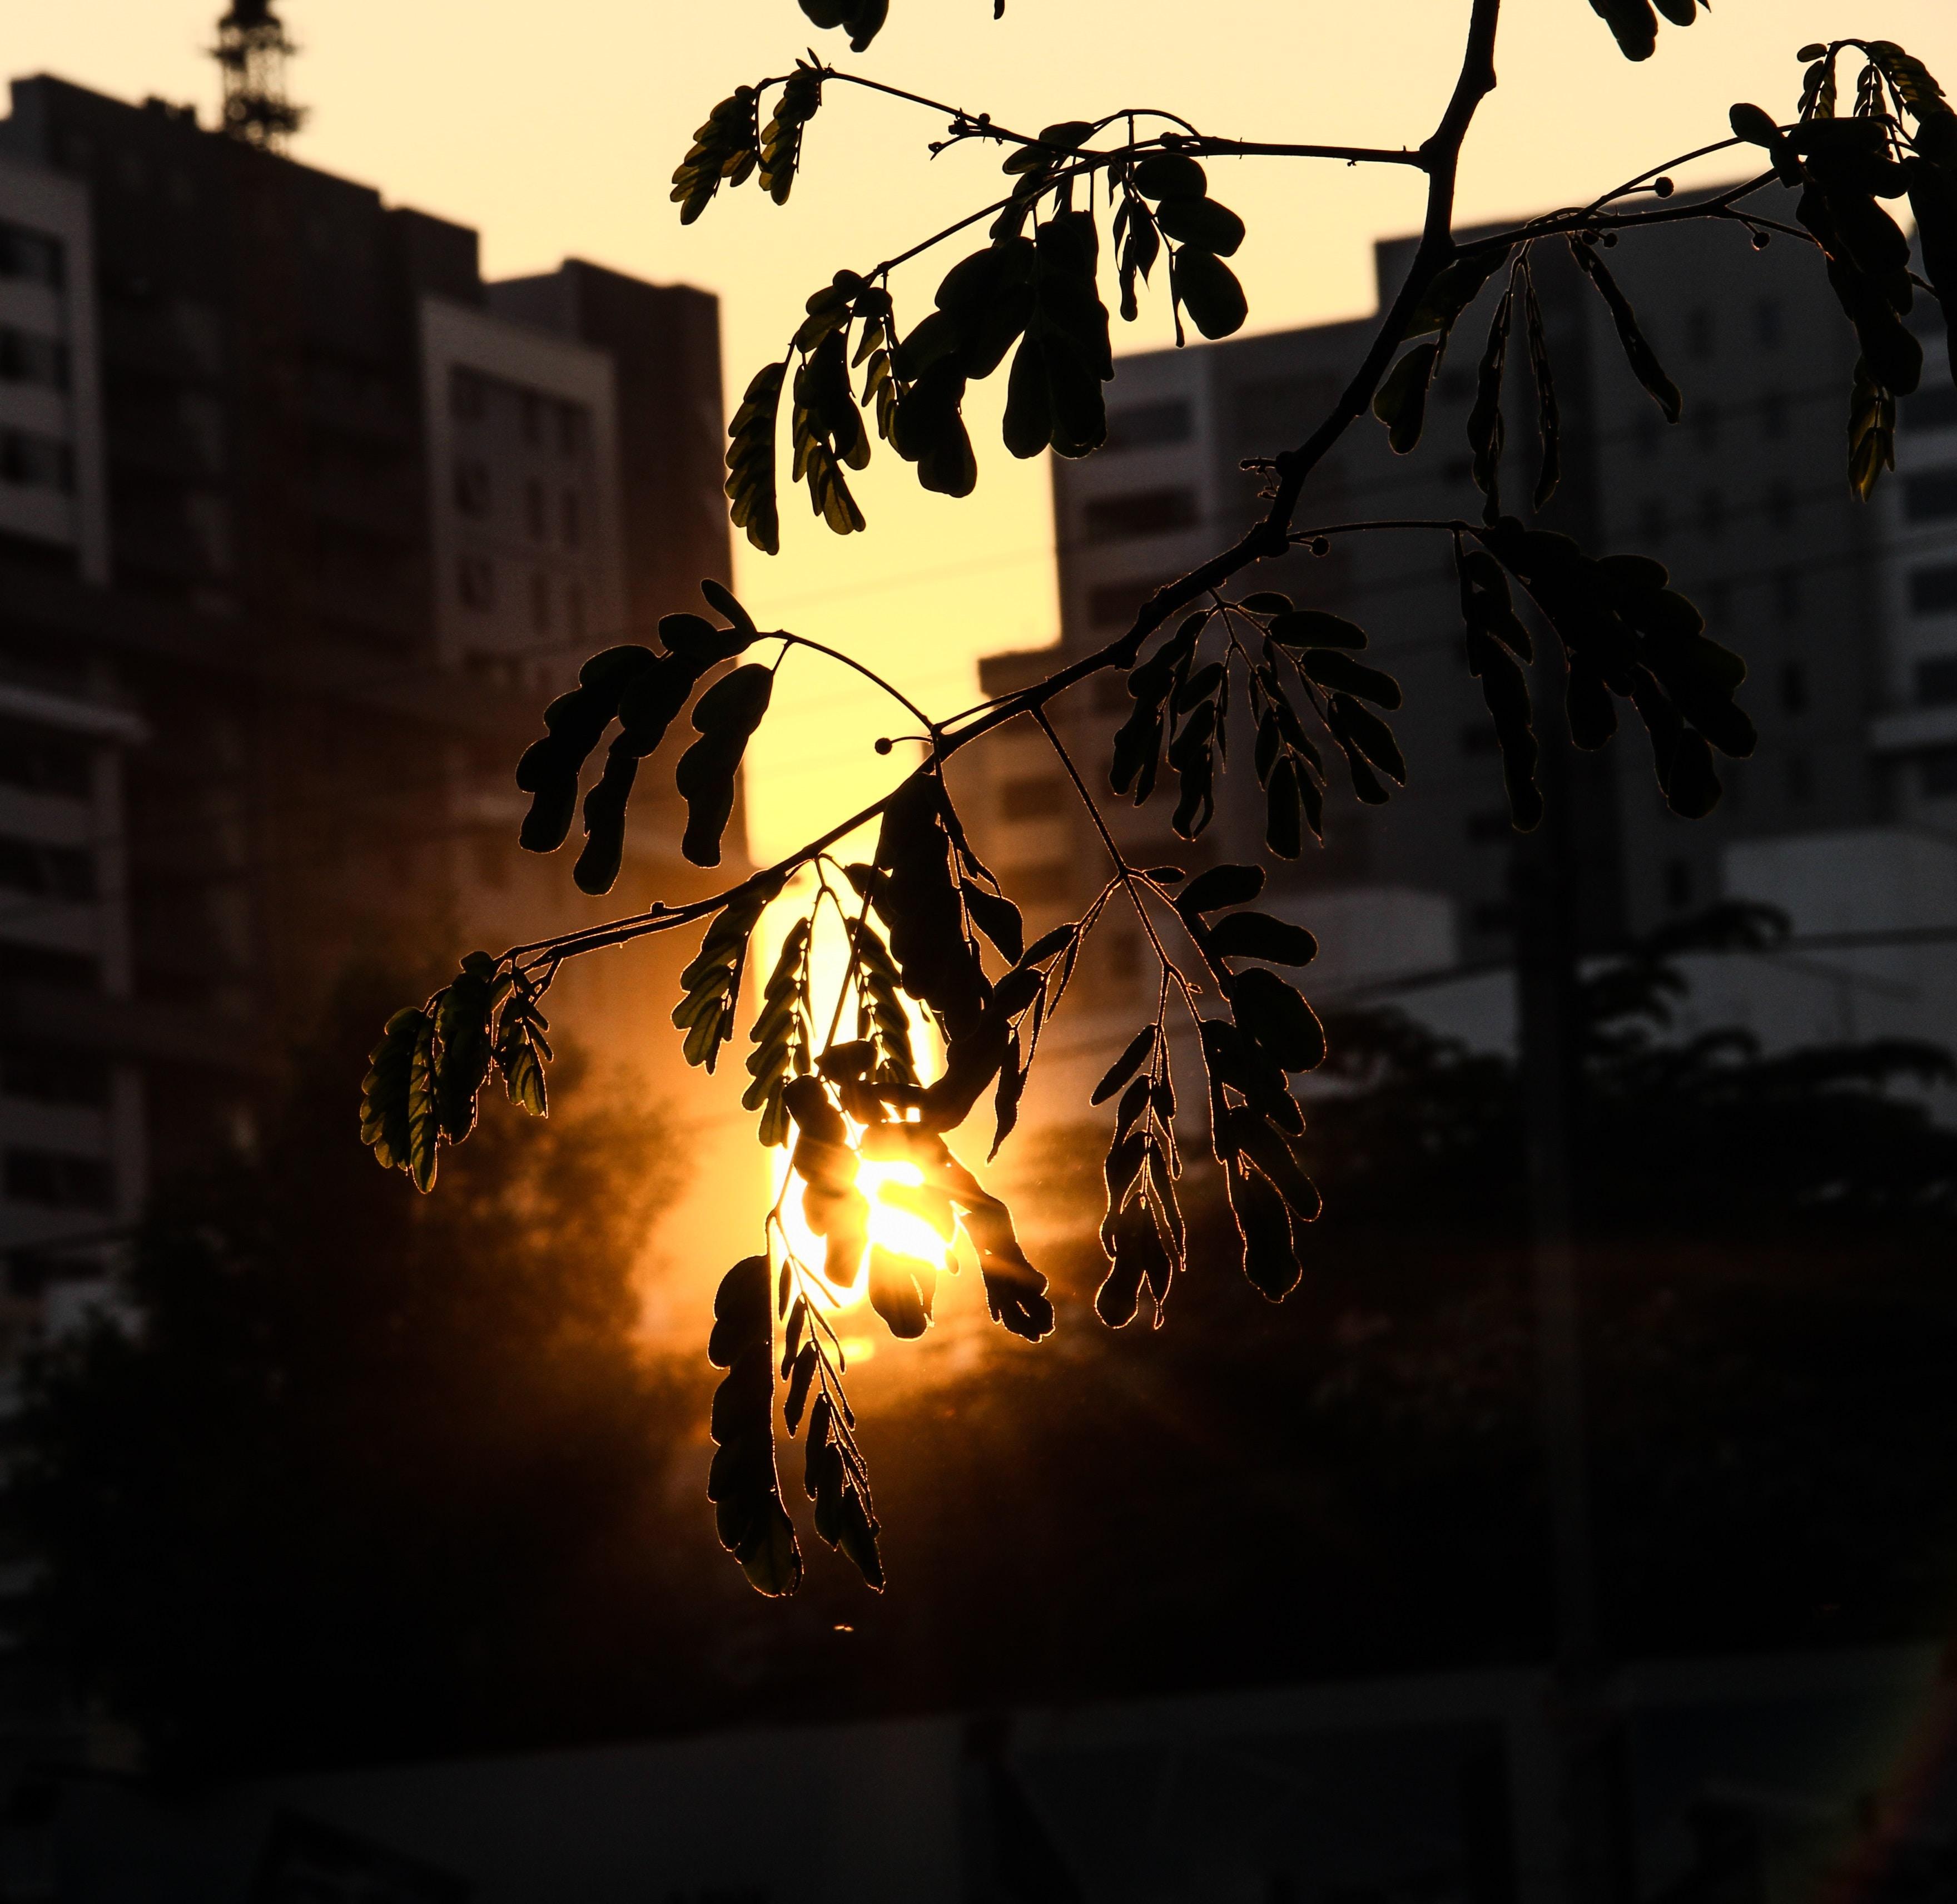 Free Unsplash photo from Rohan Kumar V.G.